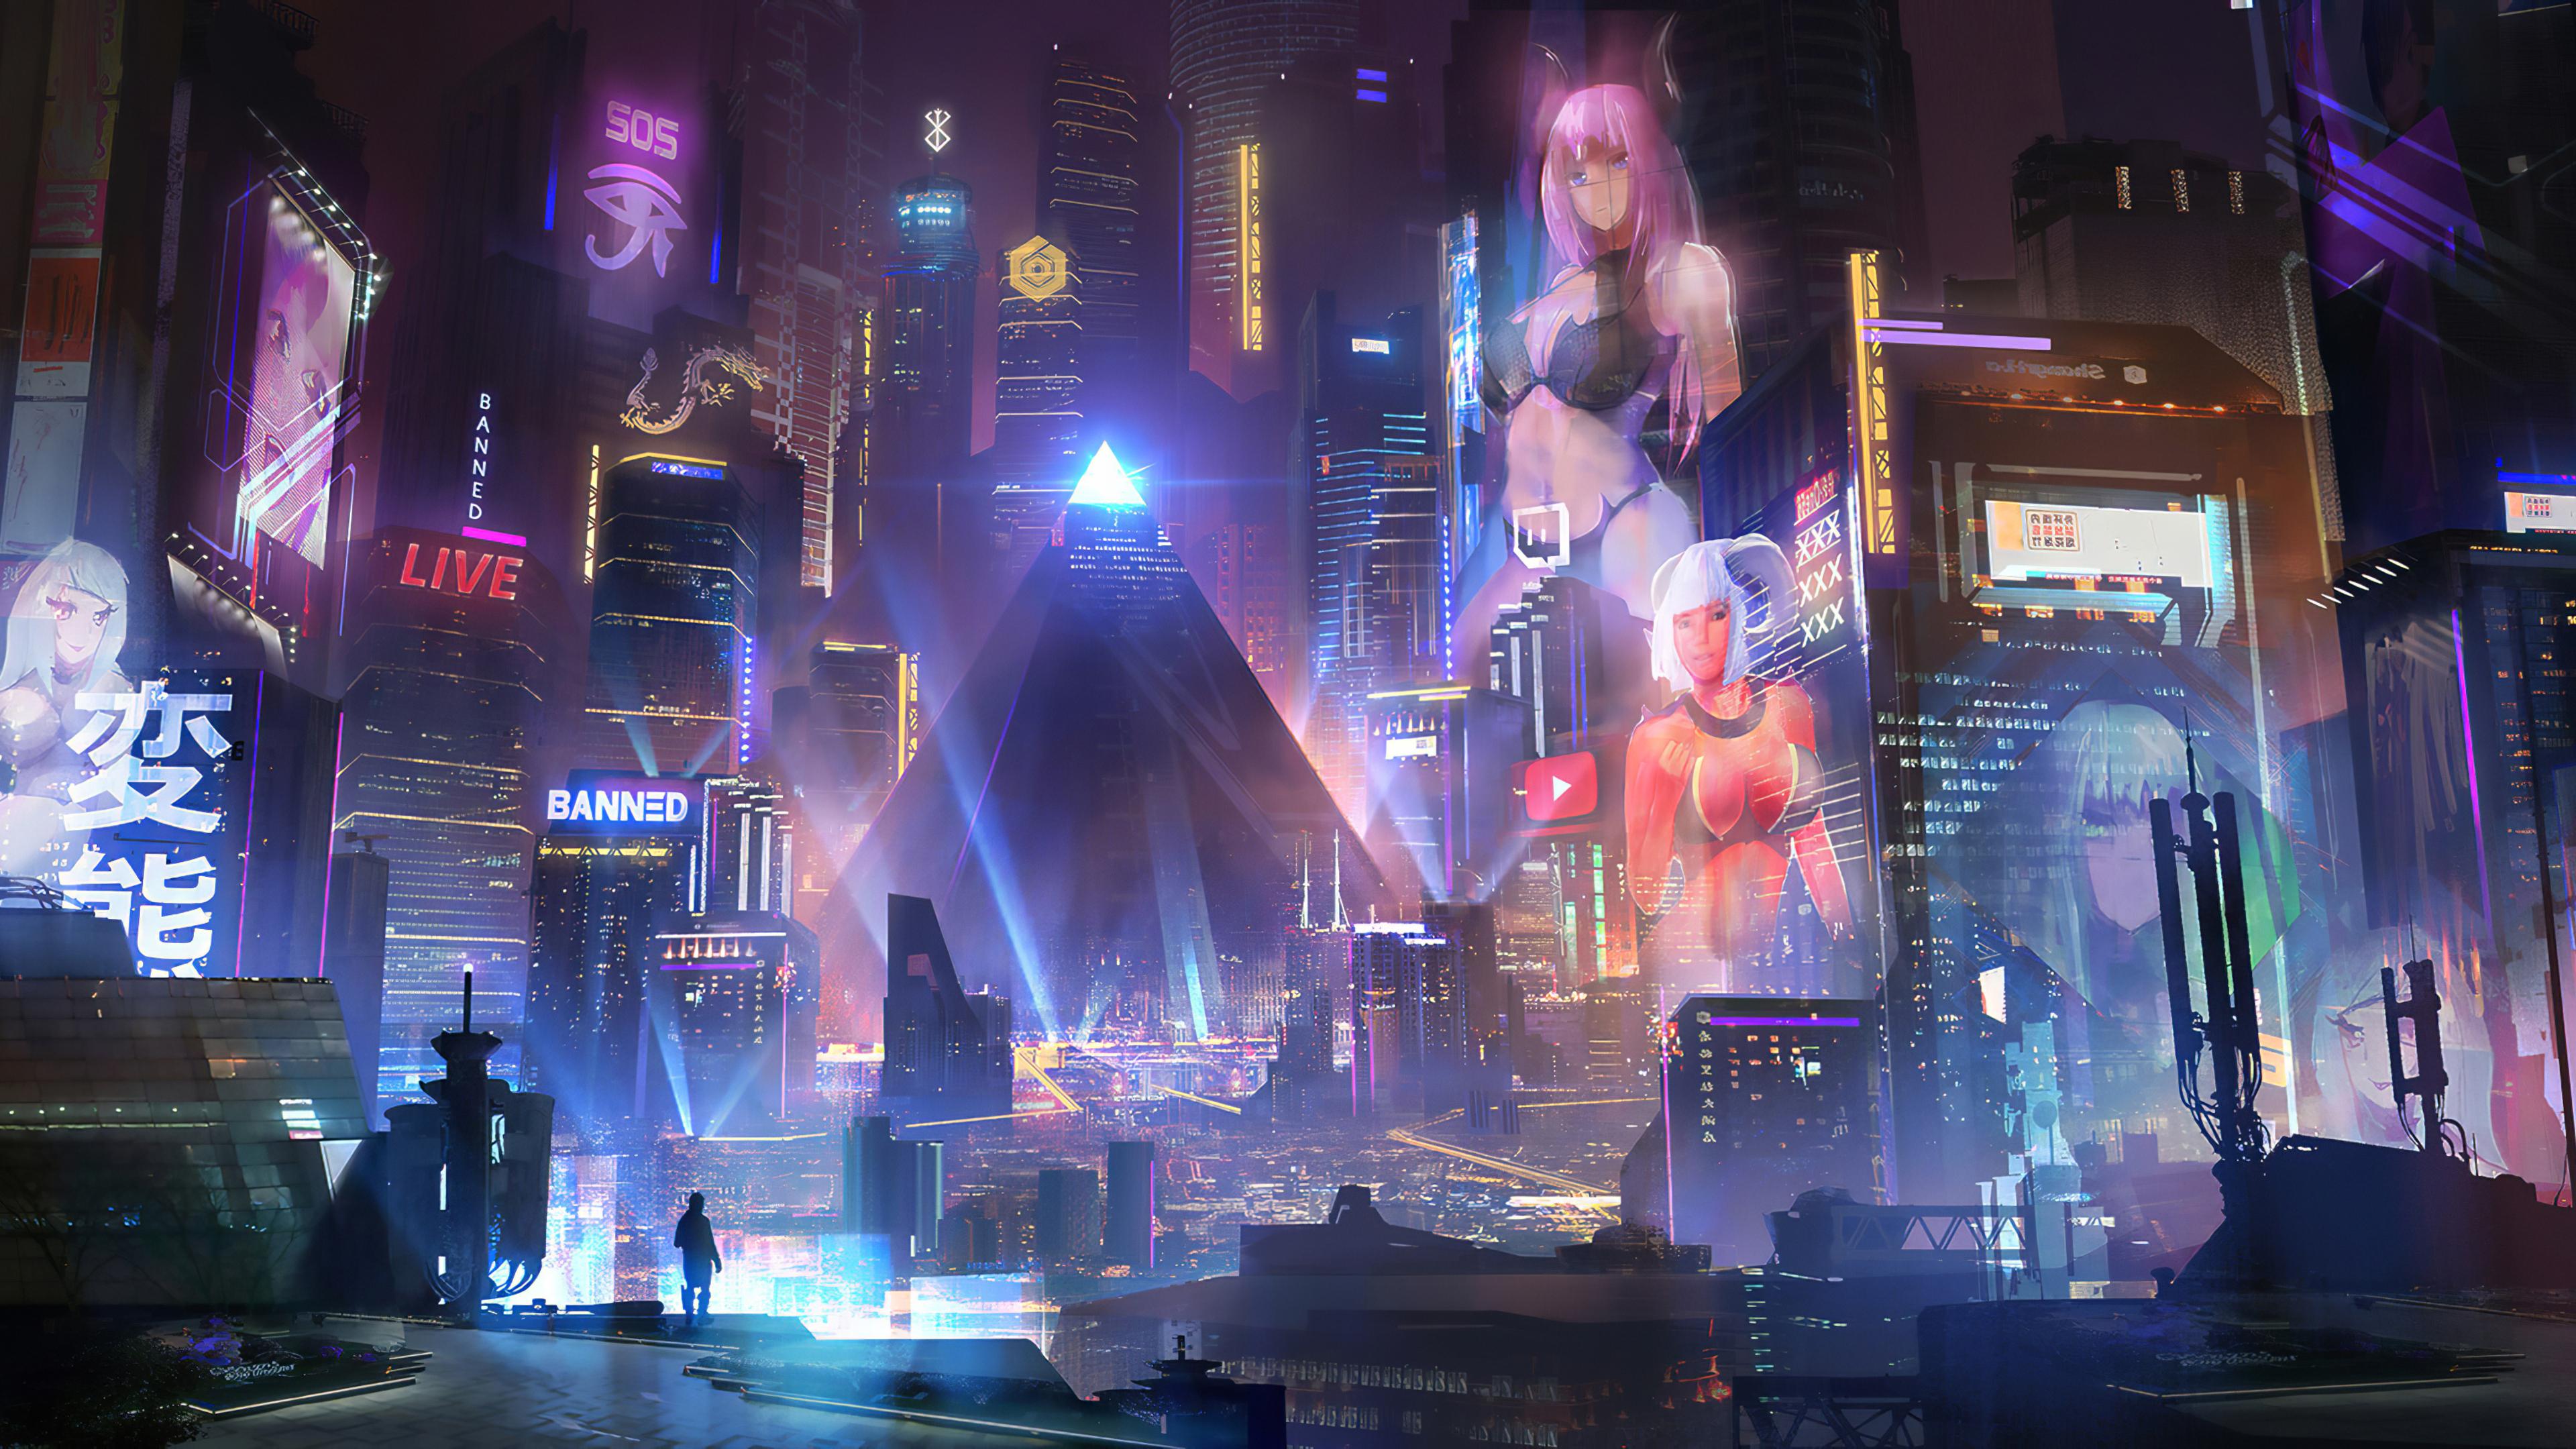 3840x2160 Cyberpunk City 4k 4k HD 4k Wallpapers, Images ...